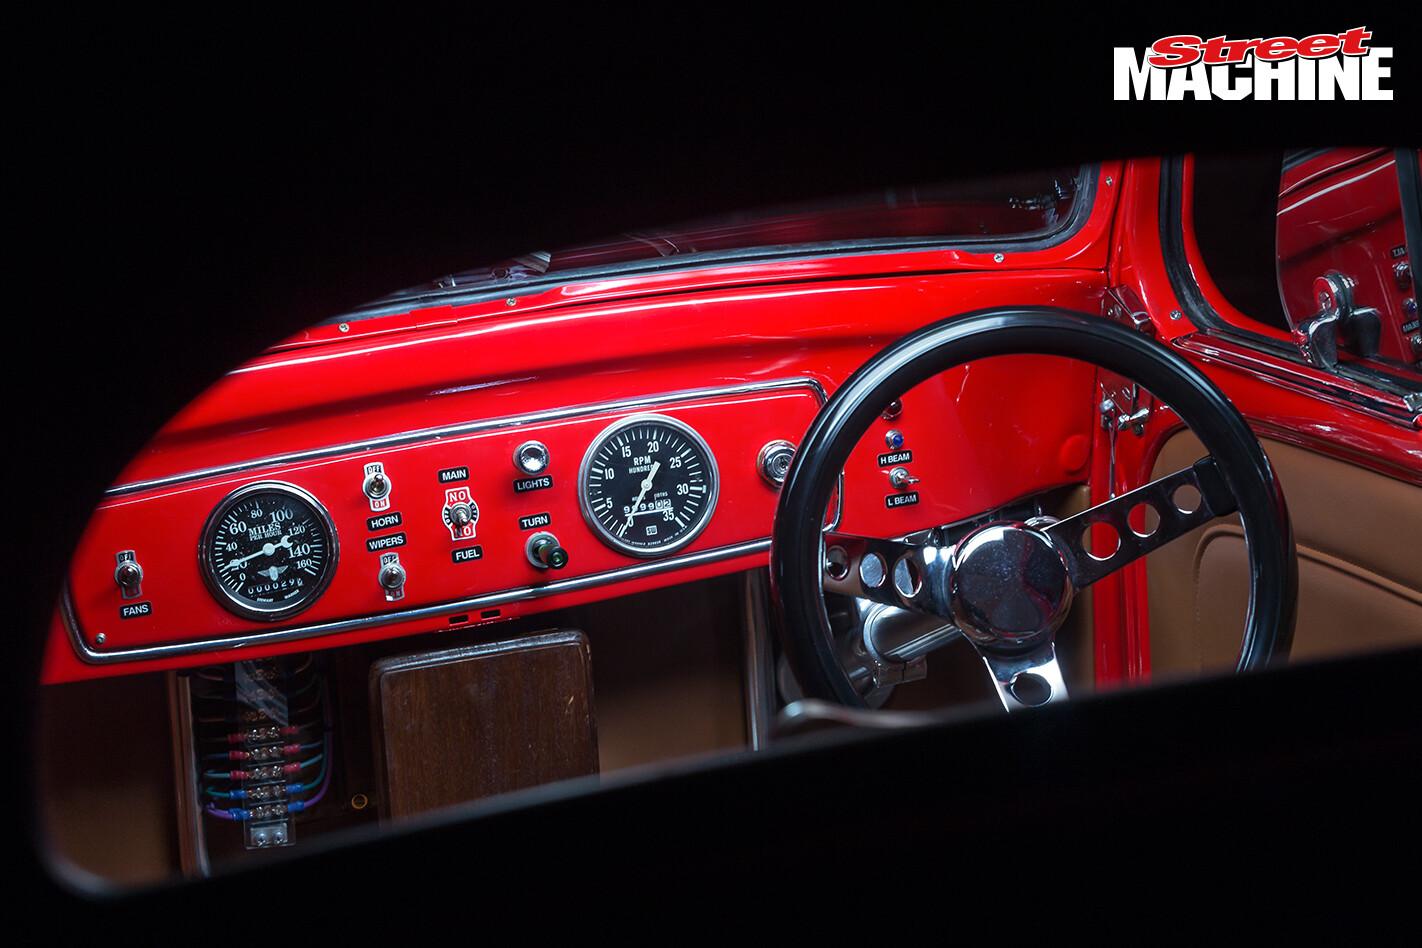 Firechief Fiat Hot Rod 4 Nw Jpg